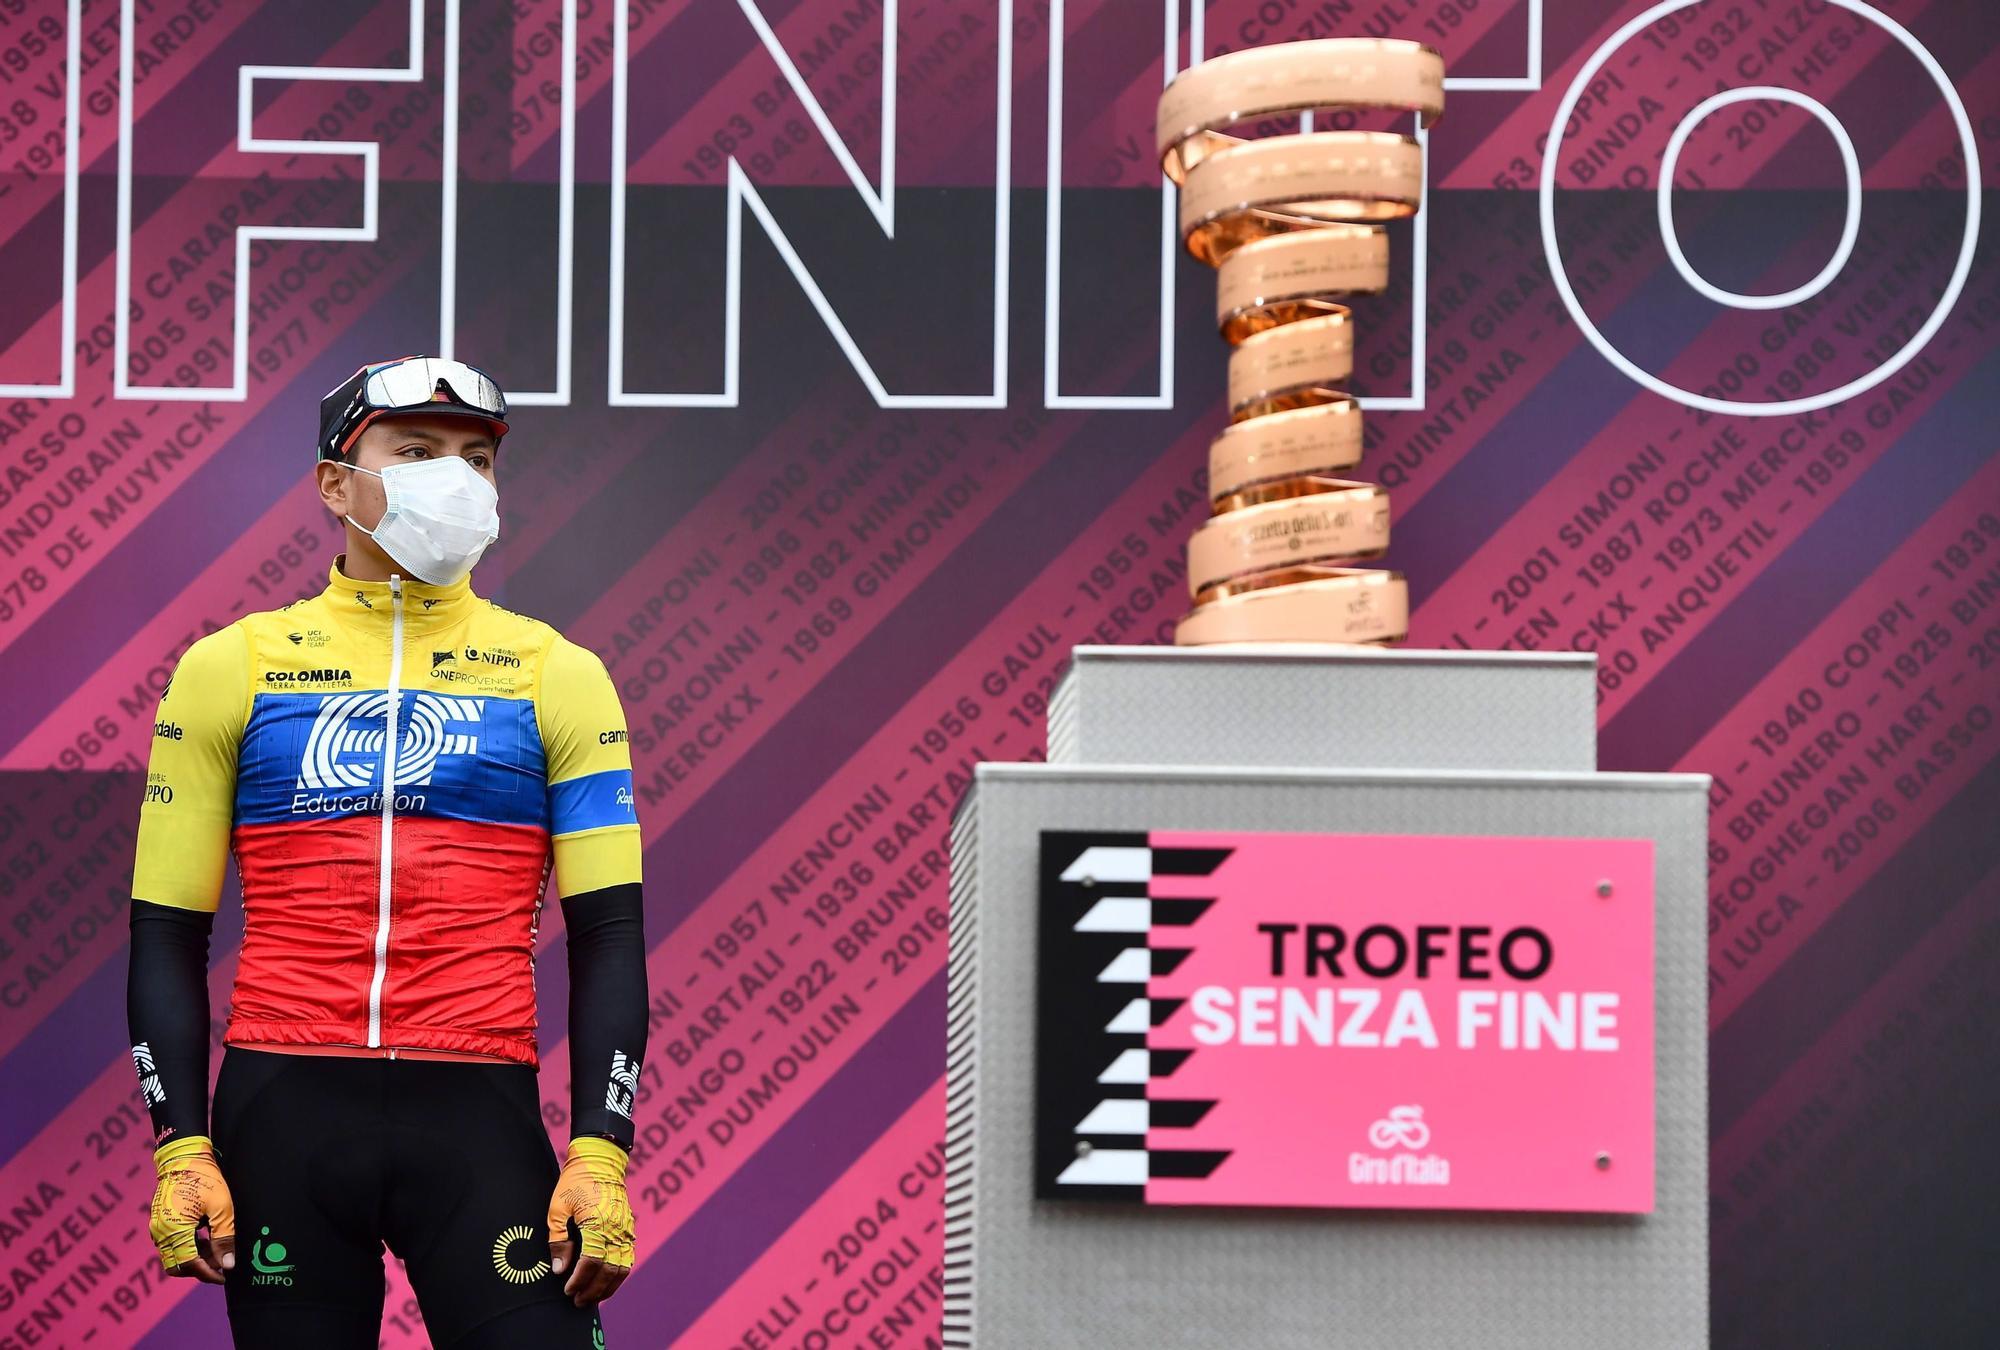 Giro de Italia: Etapa Biella - Canale